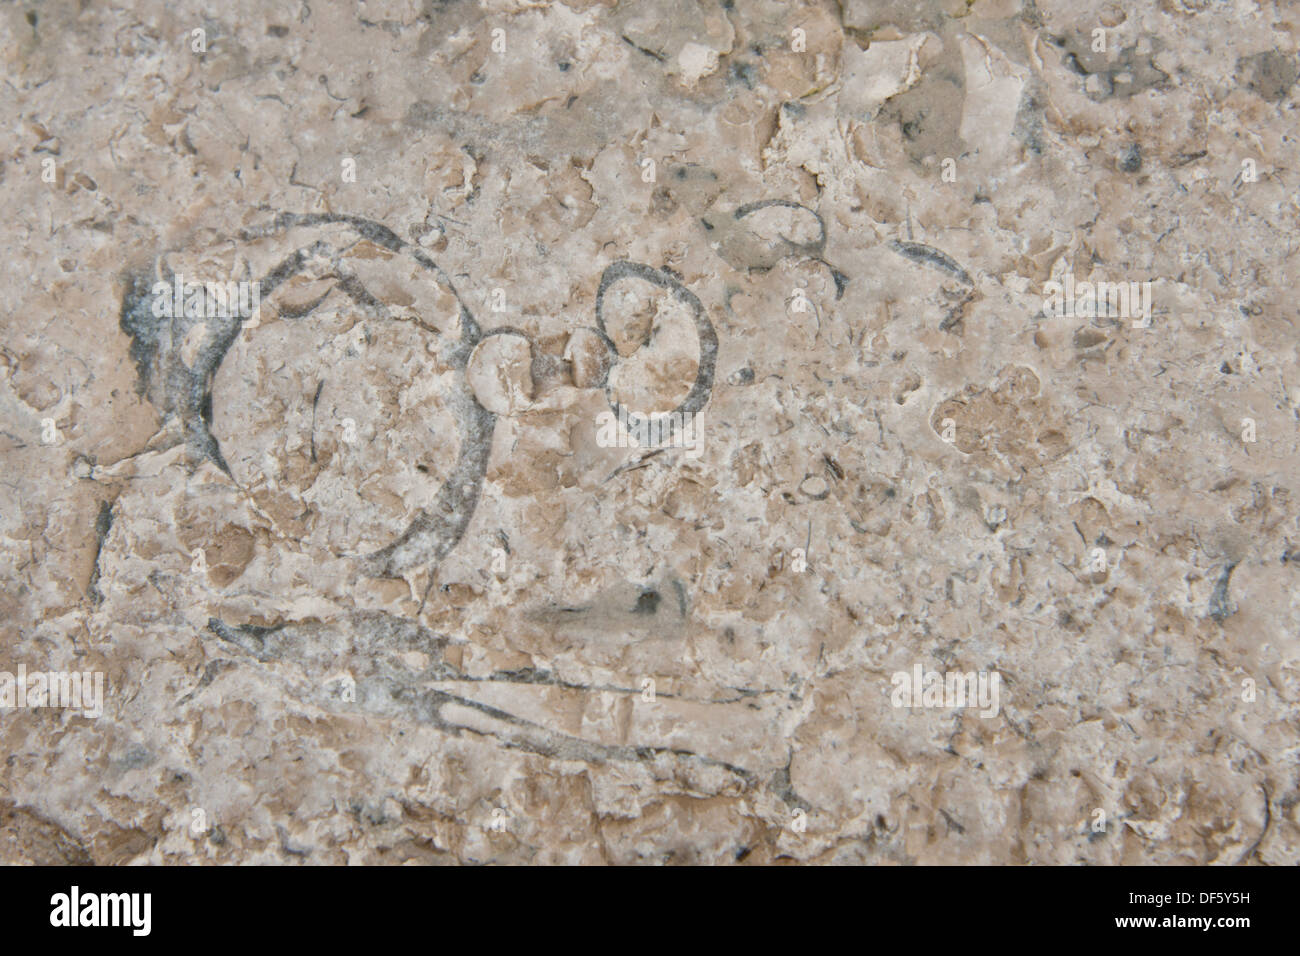 Canada, Arctic Archipelago, Nunavut, Akpatok Island, Qikiqtaaluk Region. Impression of prehistoric fossils. - Stock Image